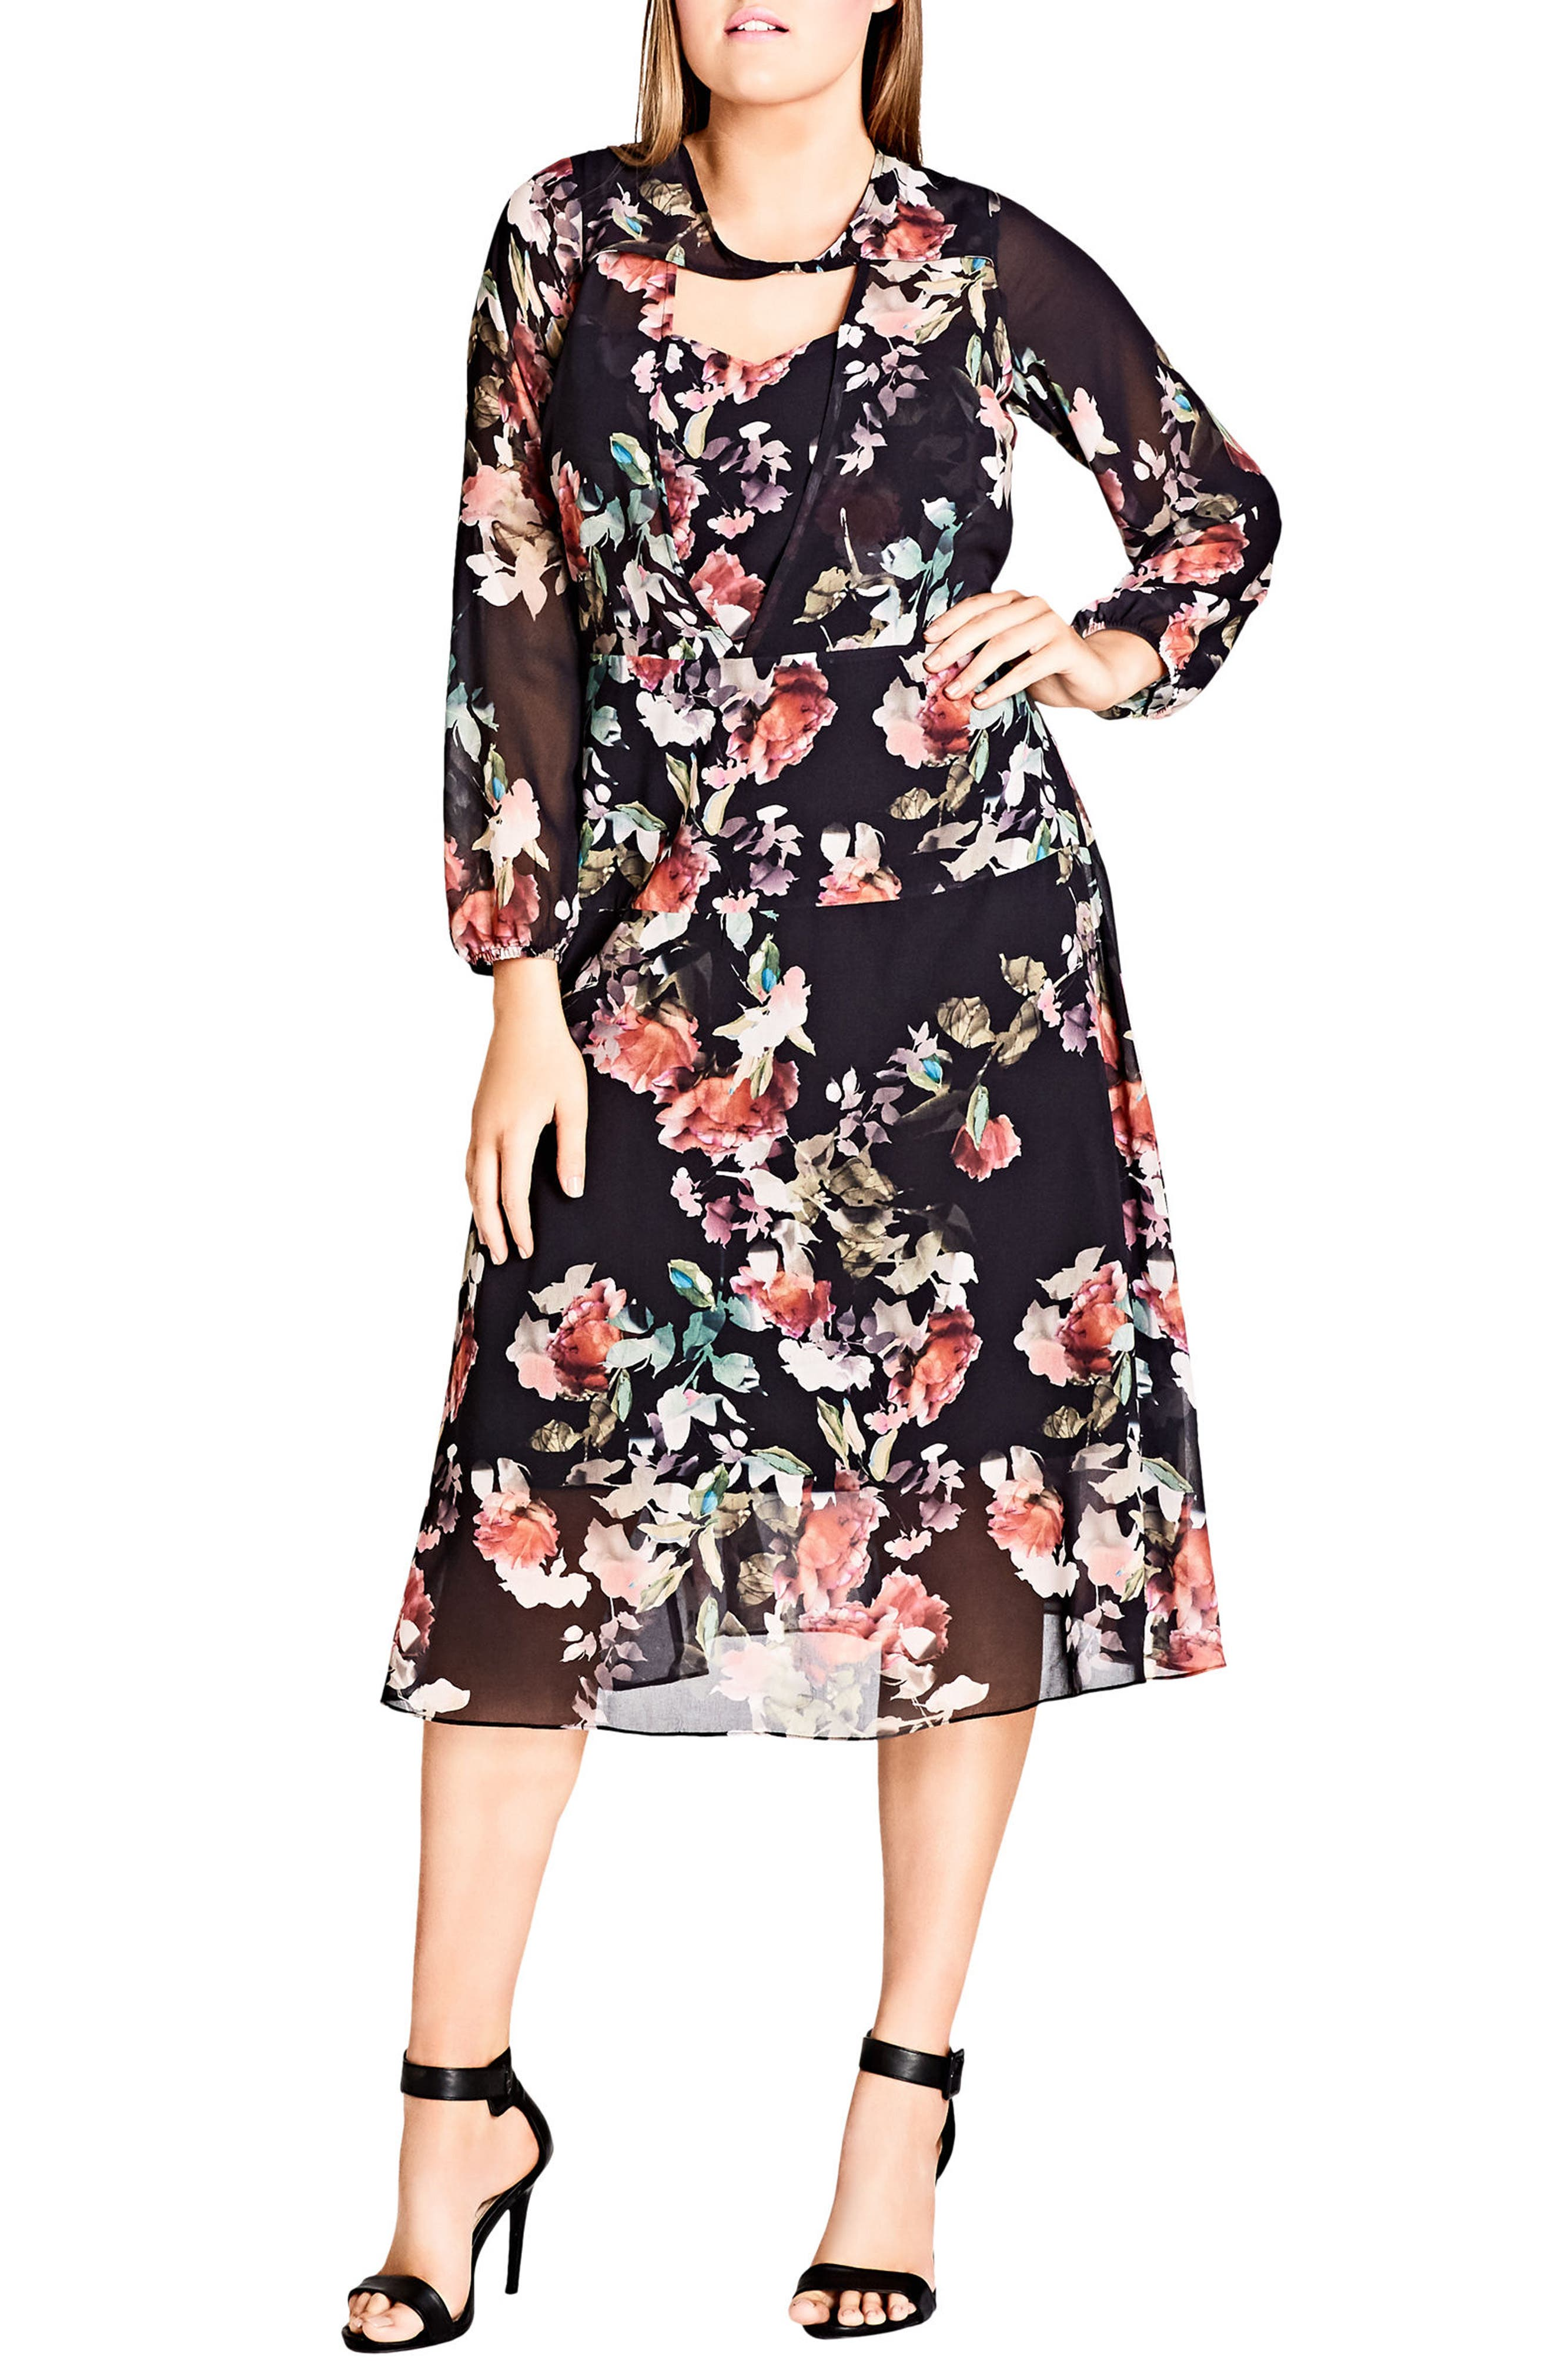 Sheer Divine Floral Print Midi Dress,                             Main thumbnail 1, color,                             001